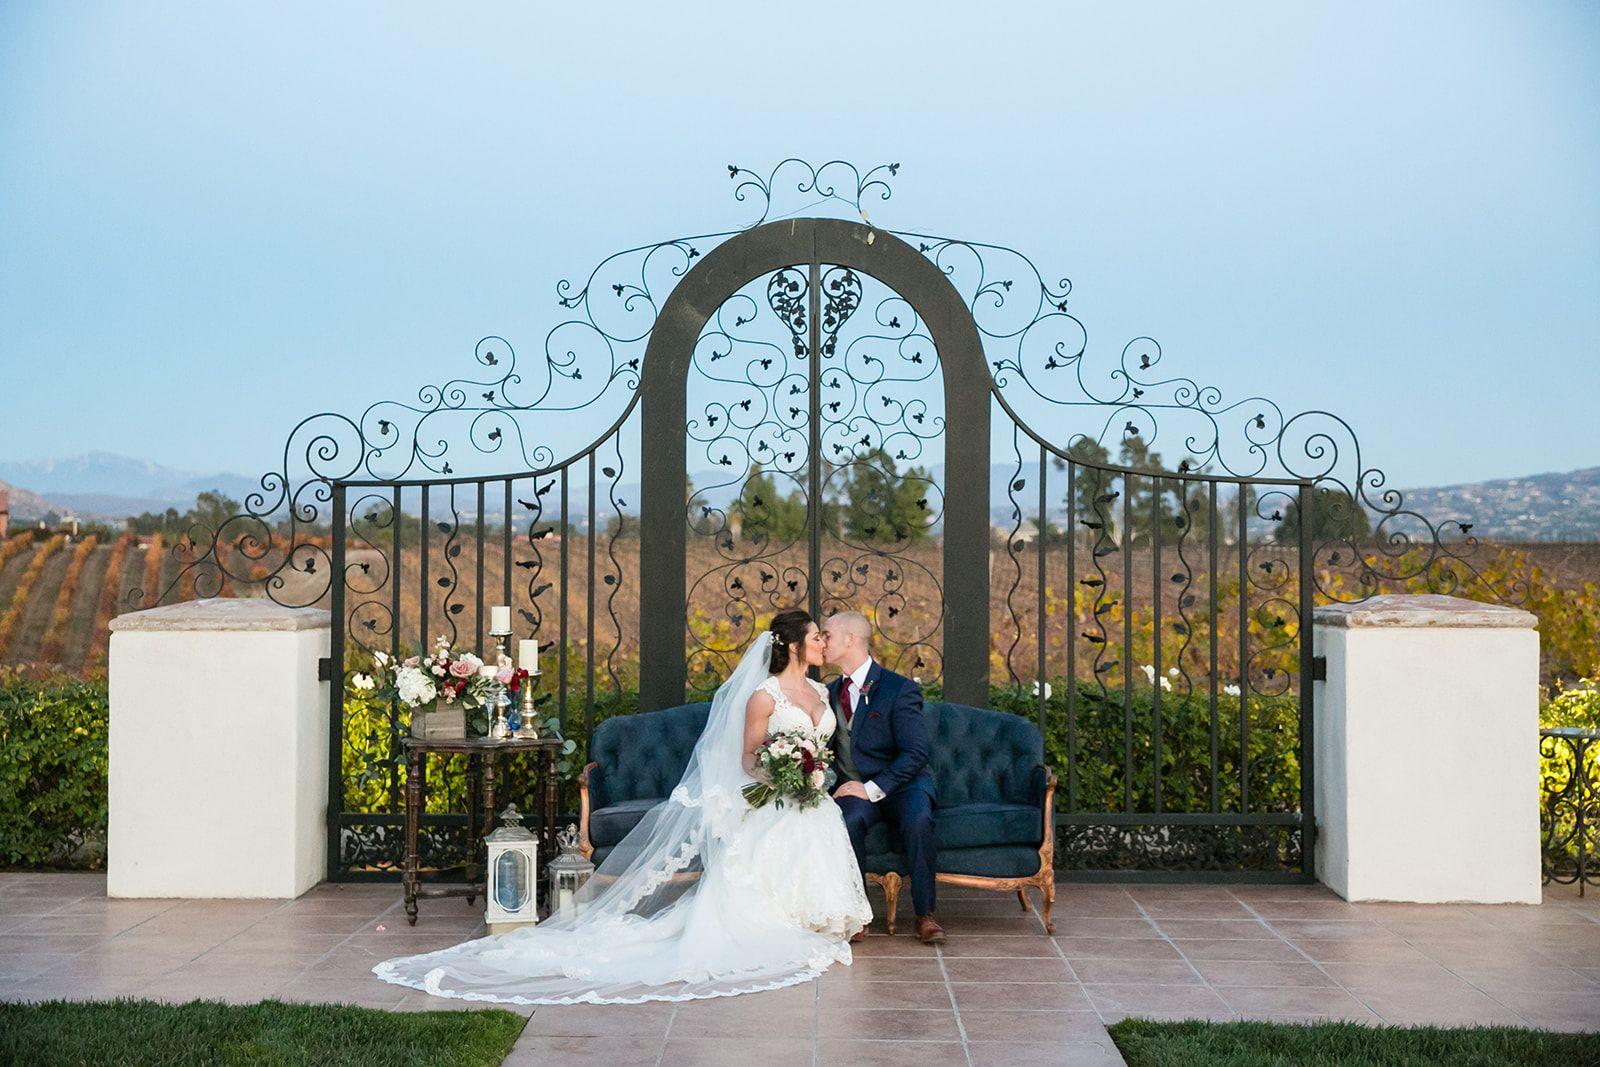 Villa De Amore Wedding Venue In Temecula California The Studio By Leah Marie California Wedding Venues Temecula Weddings Orange County Wedding Photographer